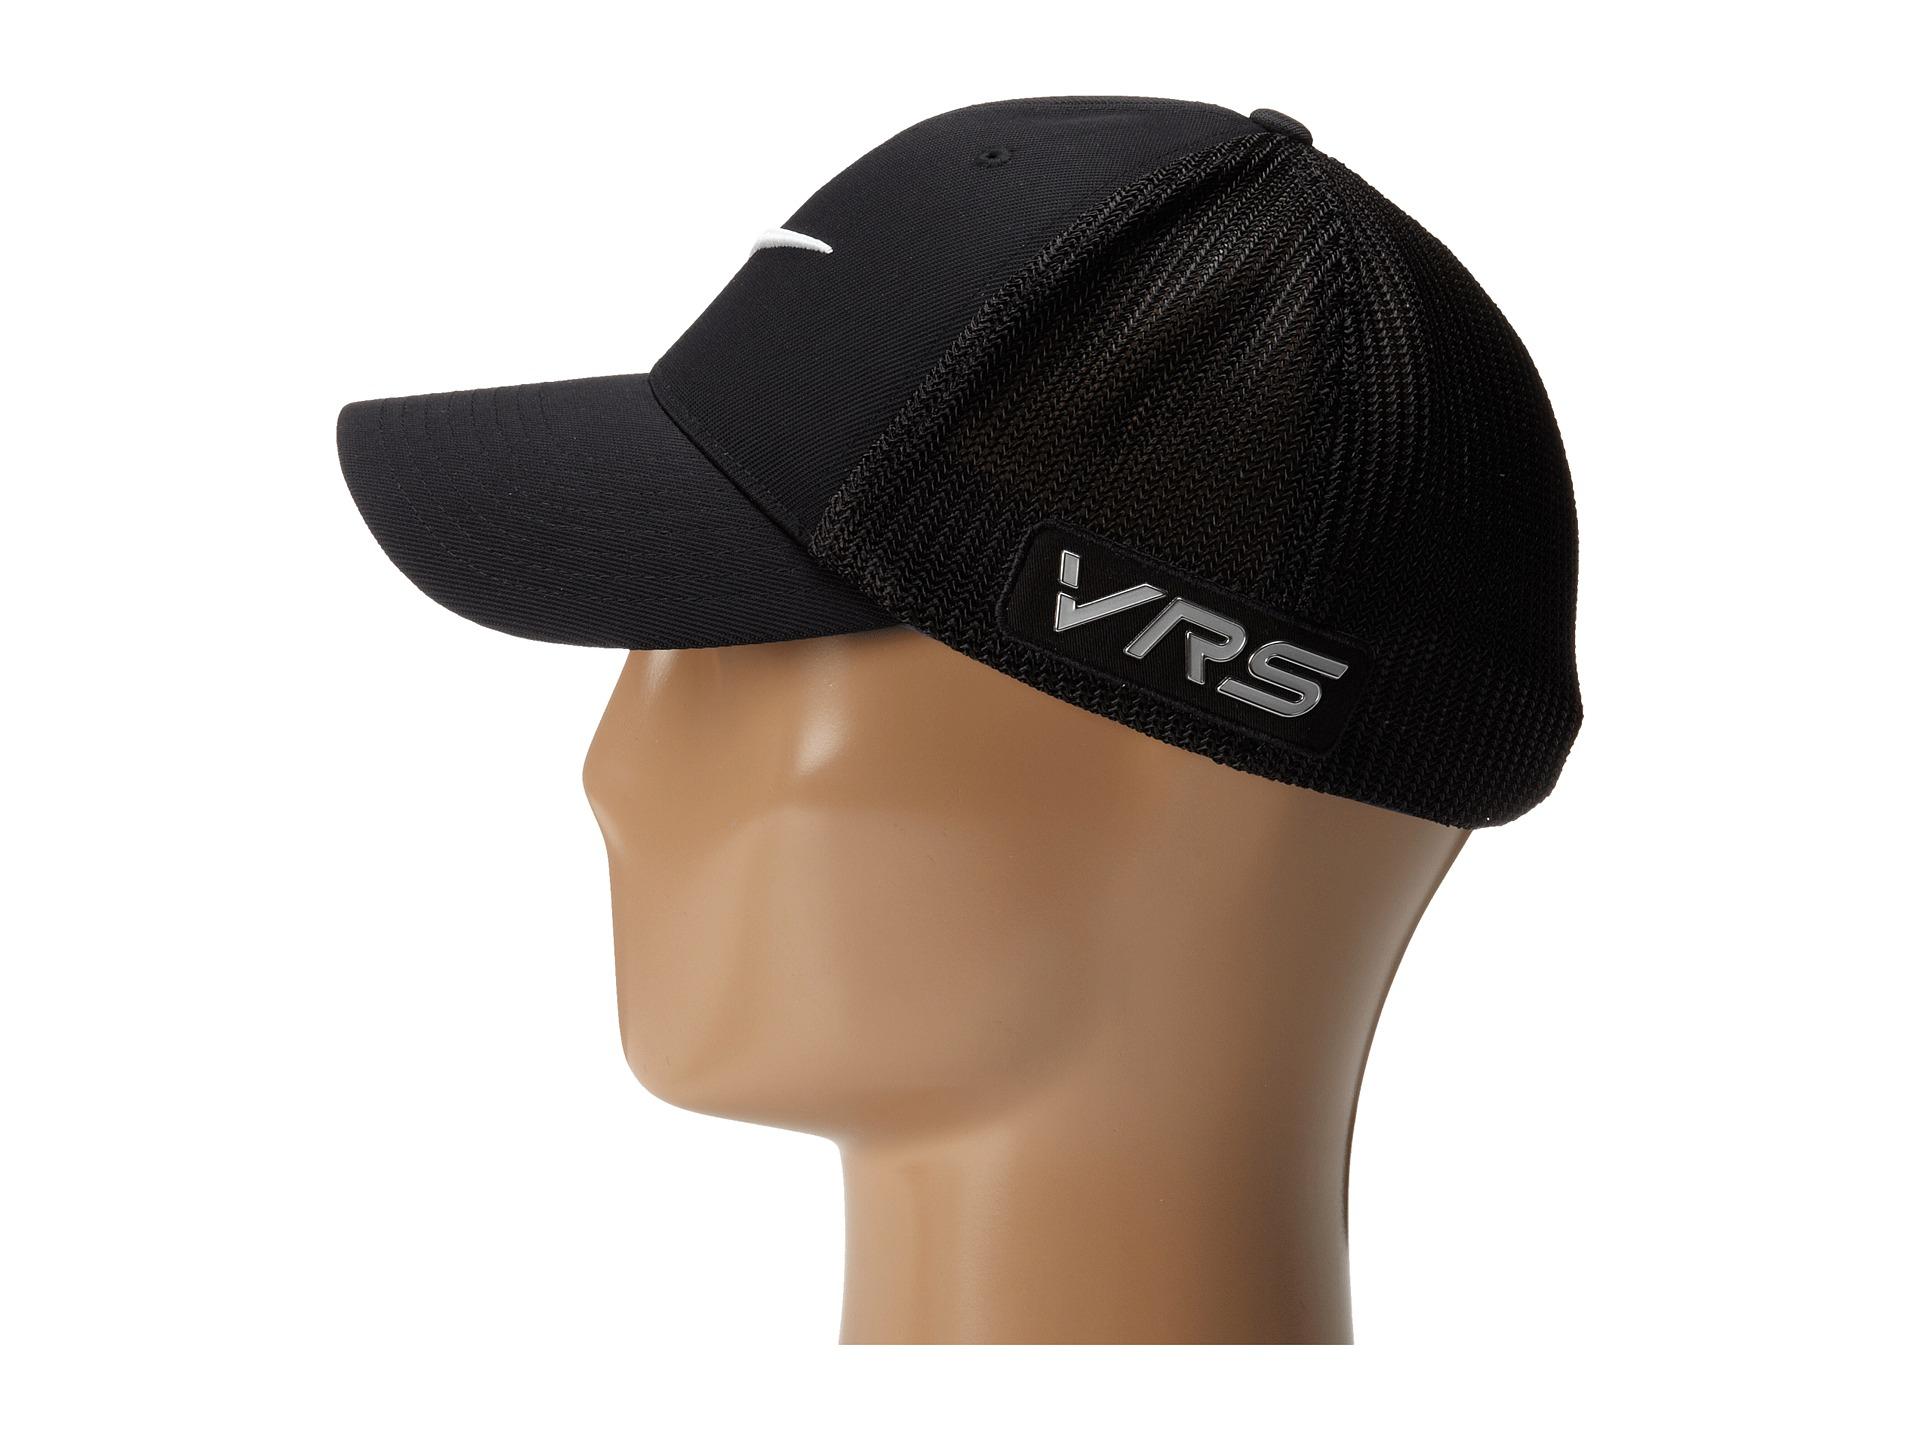 Lyst - Nike Tour Flexfit Cap in Black for Men aae4cc7b205